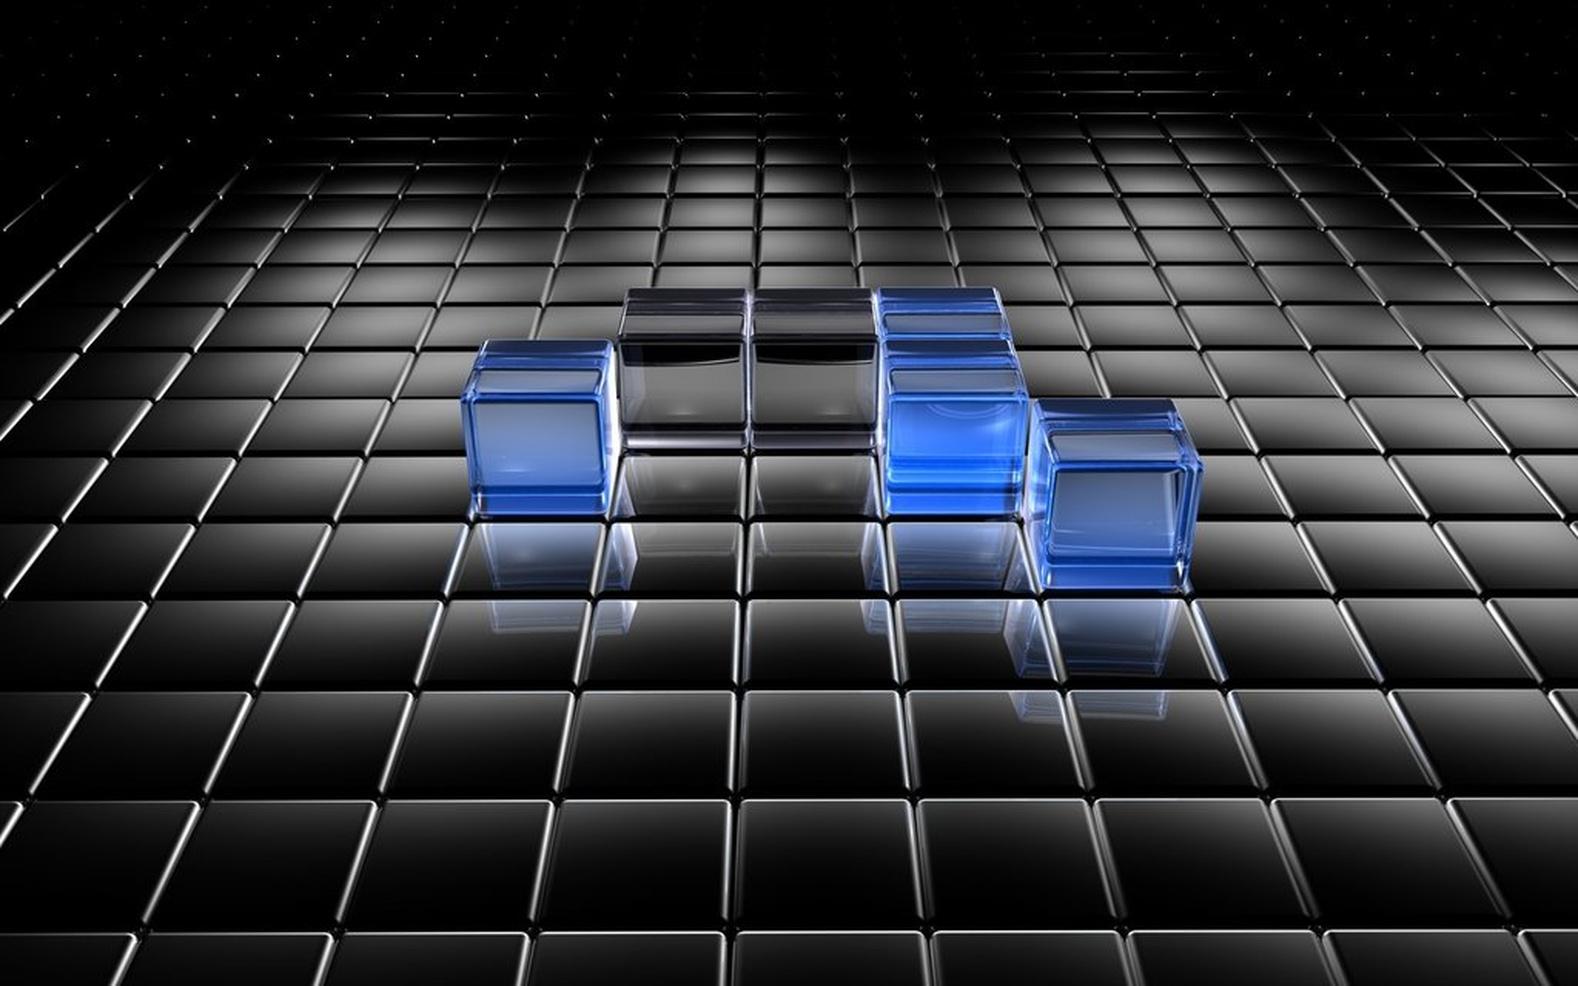 Black Wallpaper Iphone: Blue And Black Iphone Wallpaper 33 Widescreen Wallpaper